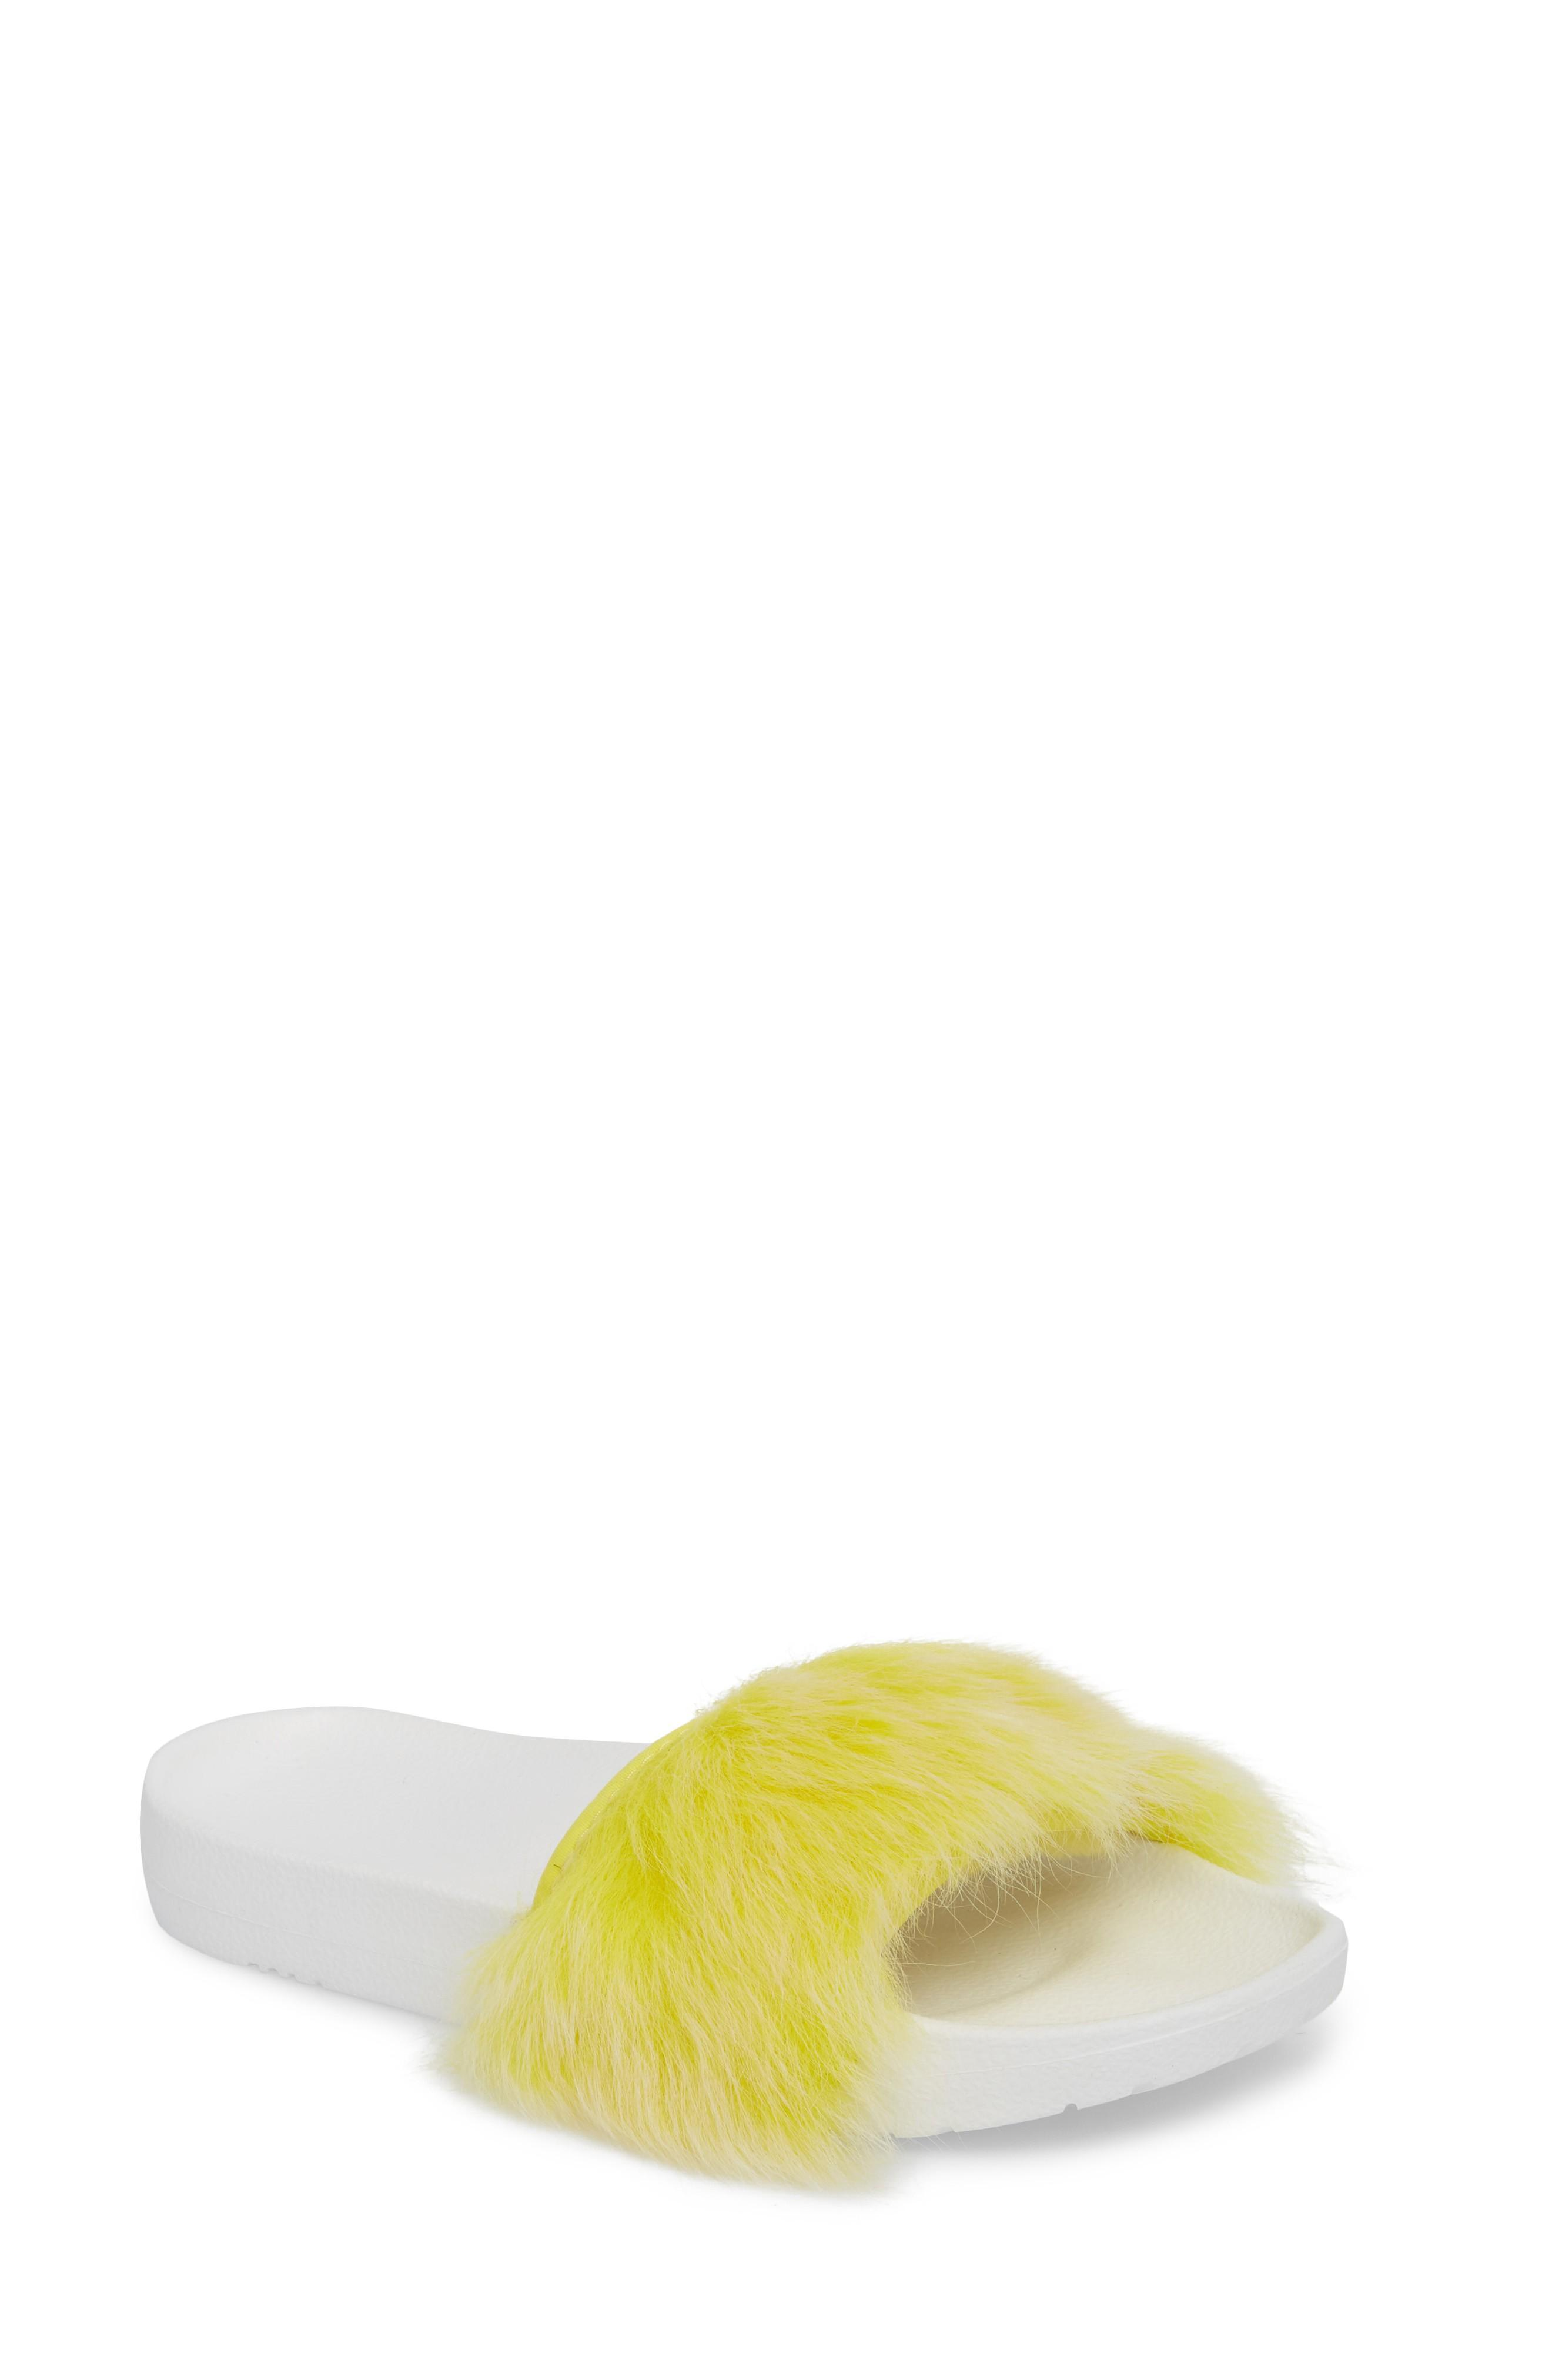 34e793fa687 Ugg Royale Genuine Shearling Slide Sandal in Lemon Yellow